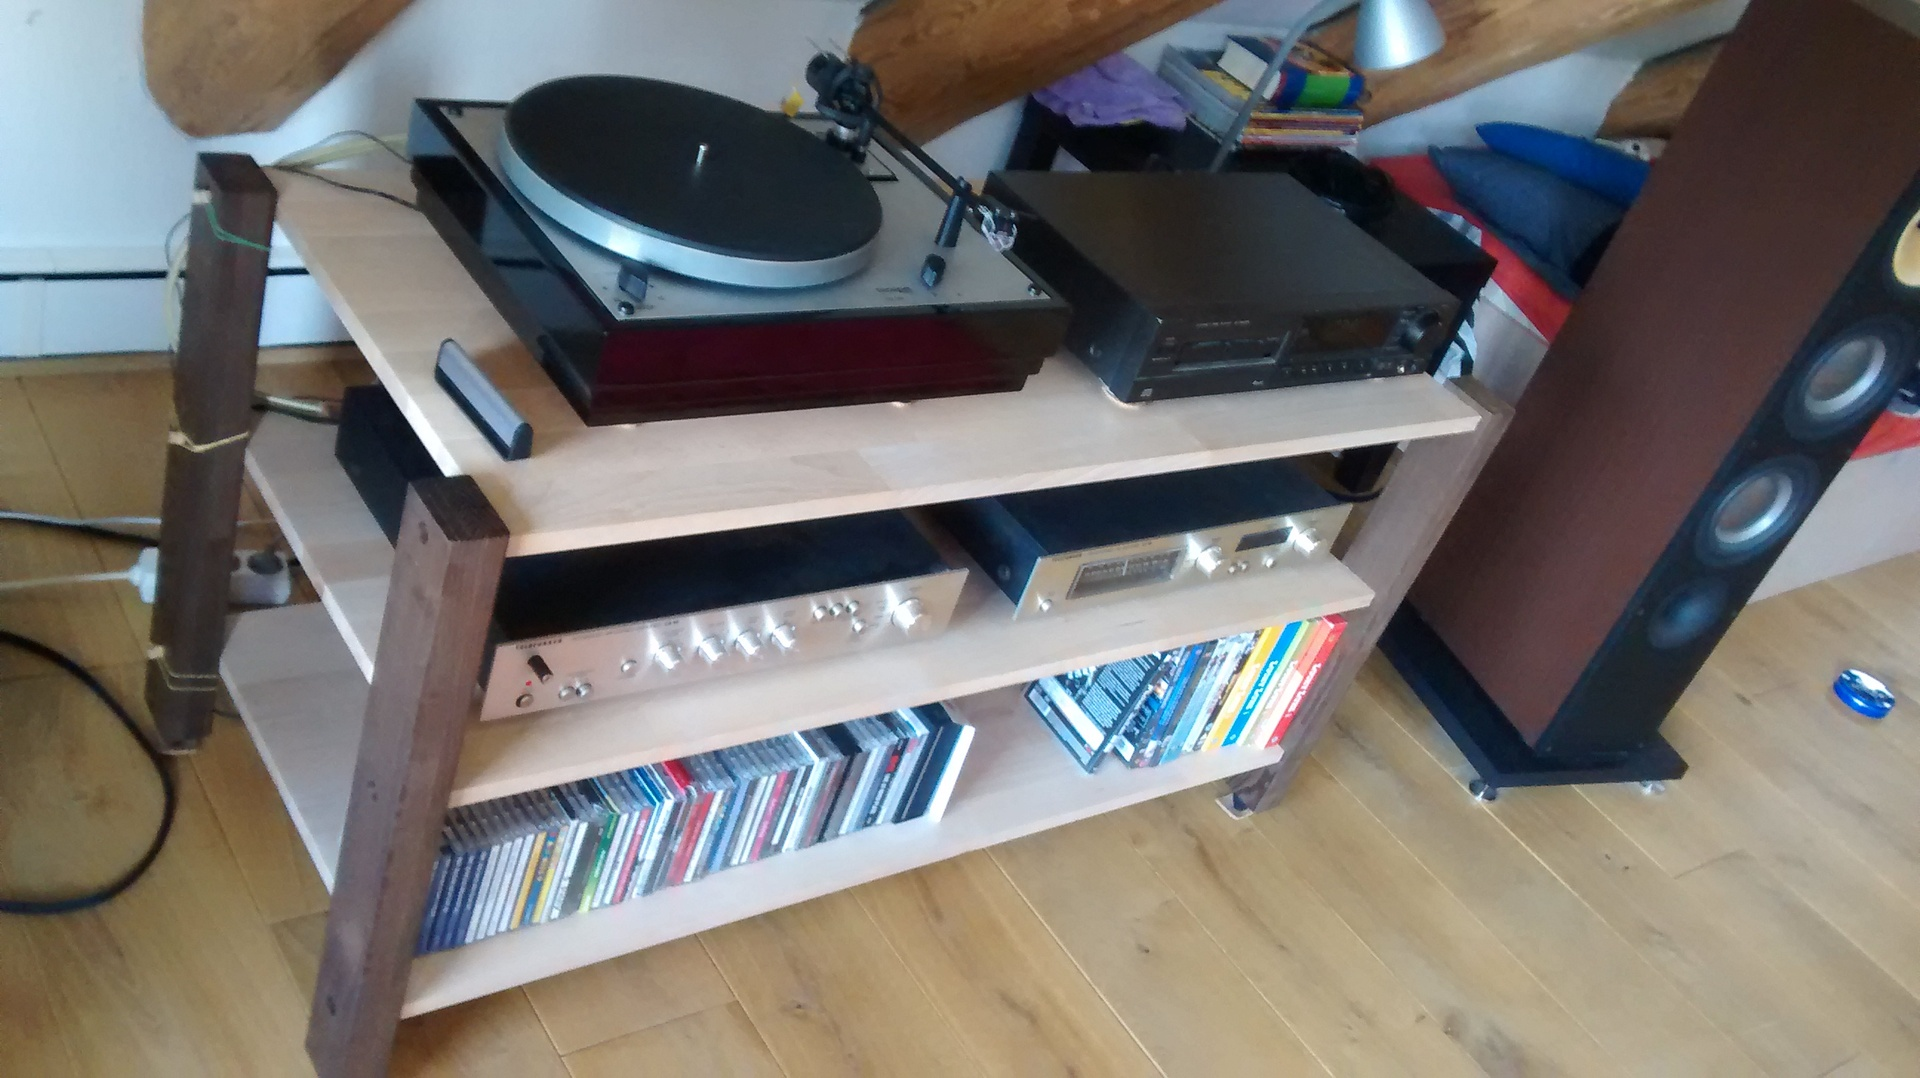 selbstbau rack iii diy iii lowboard notrebo rack. Black Bedroom Furniture Sets. Home Design Ideas